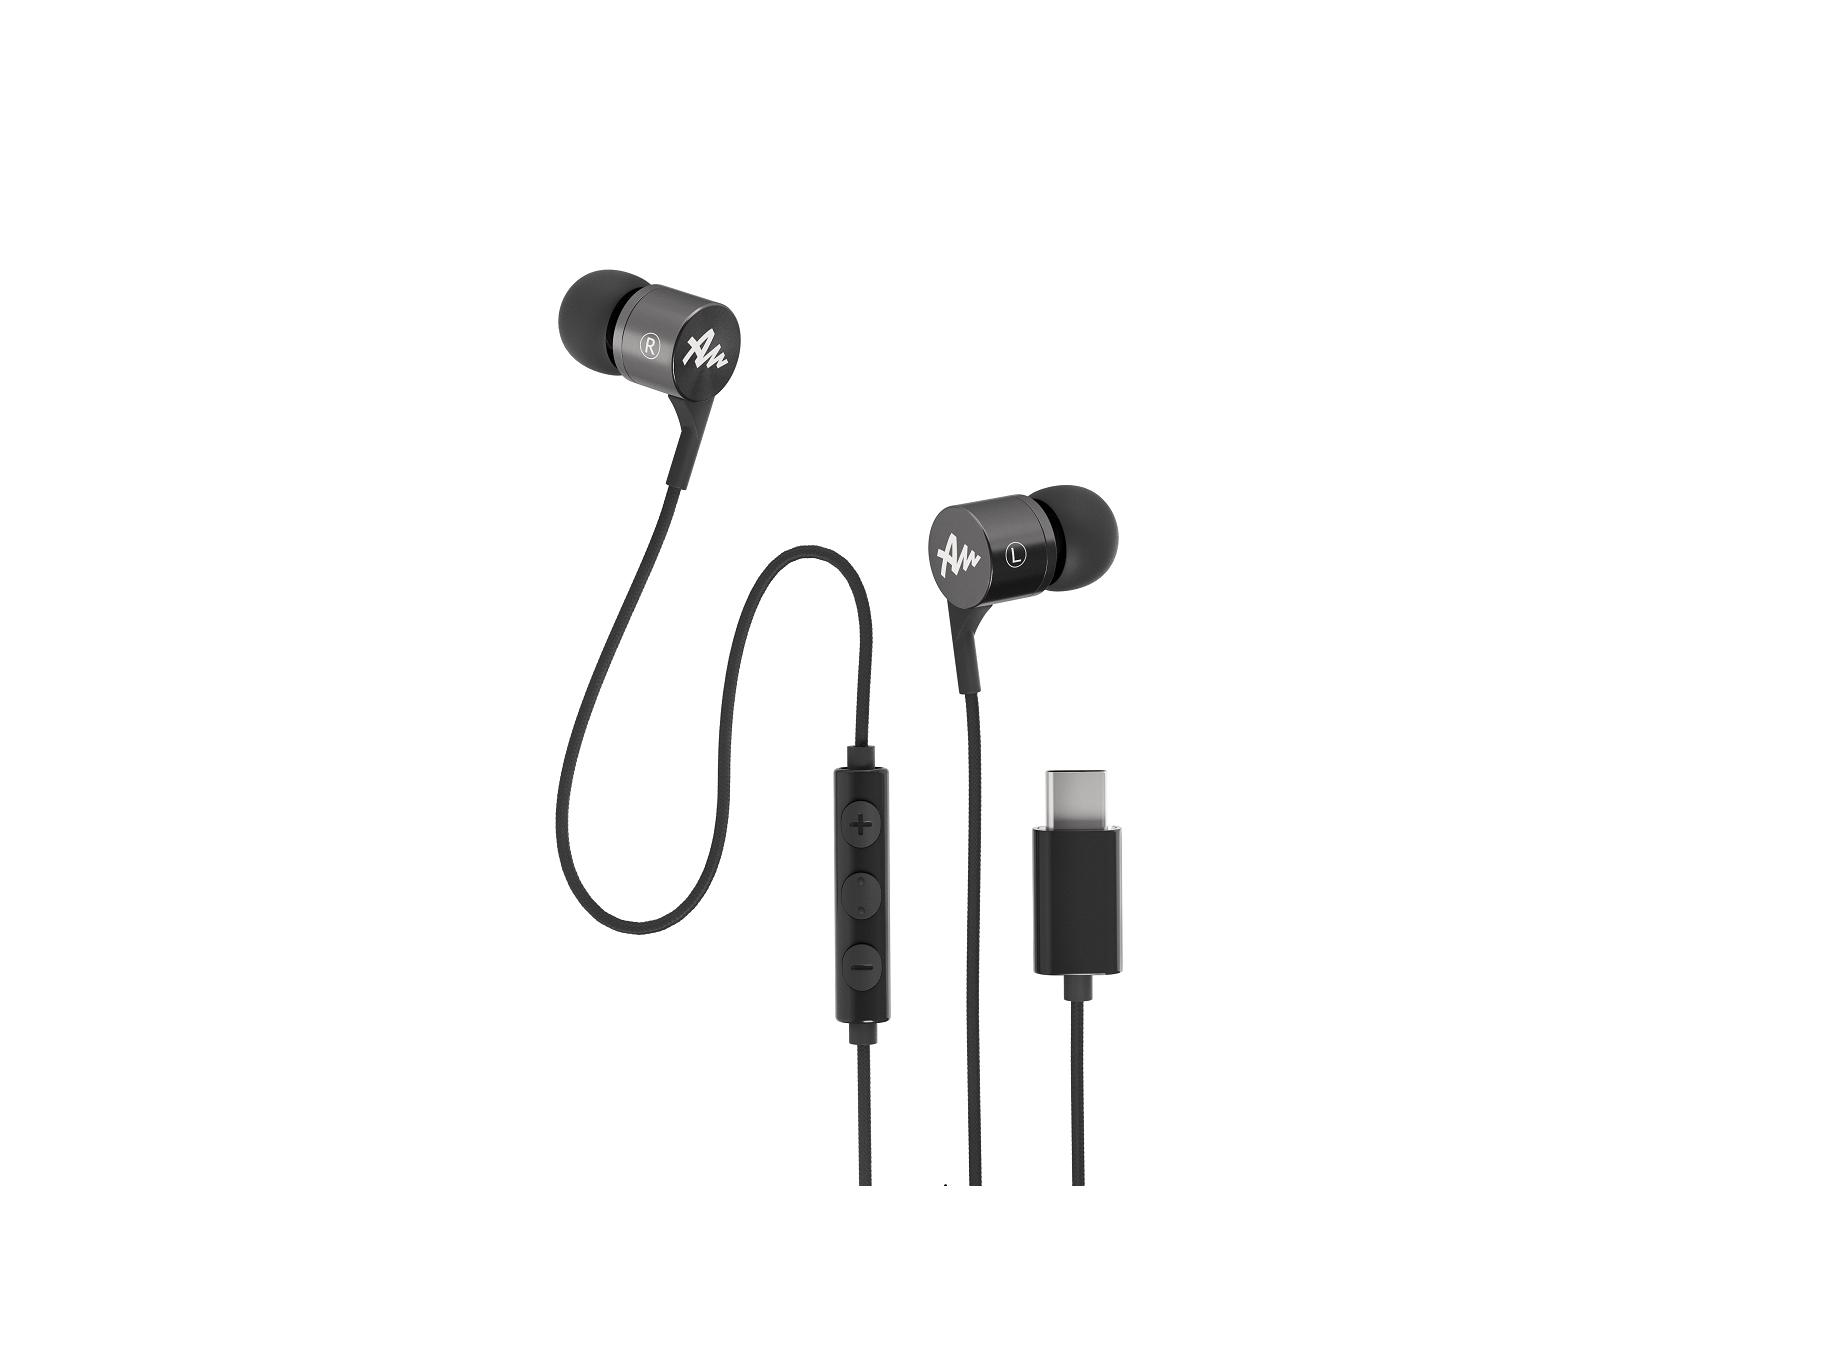 Sluchátka Audictus Explorer Type-C jdou vstříc moderním trendům